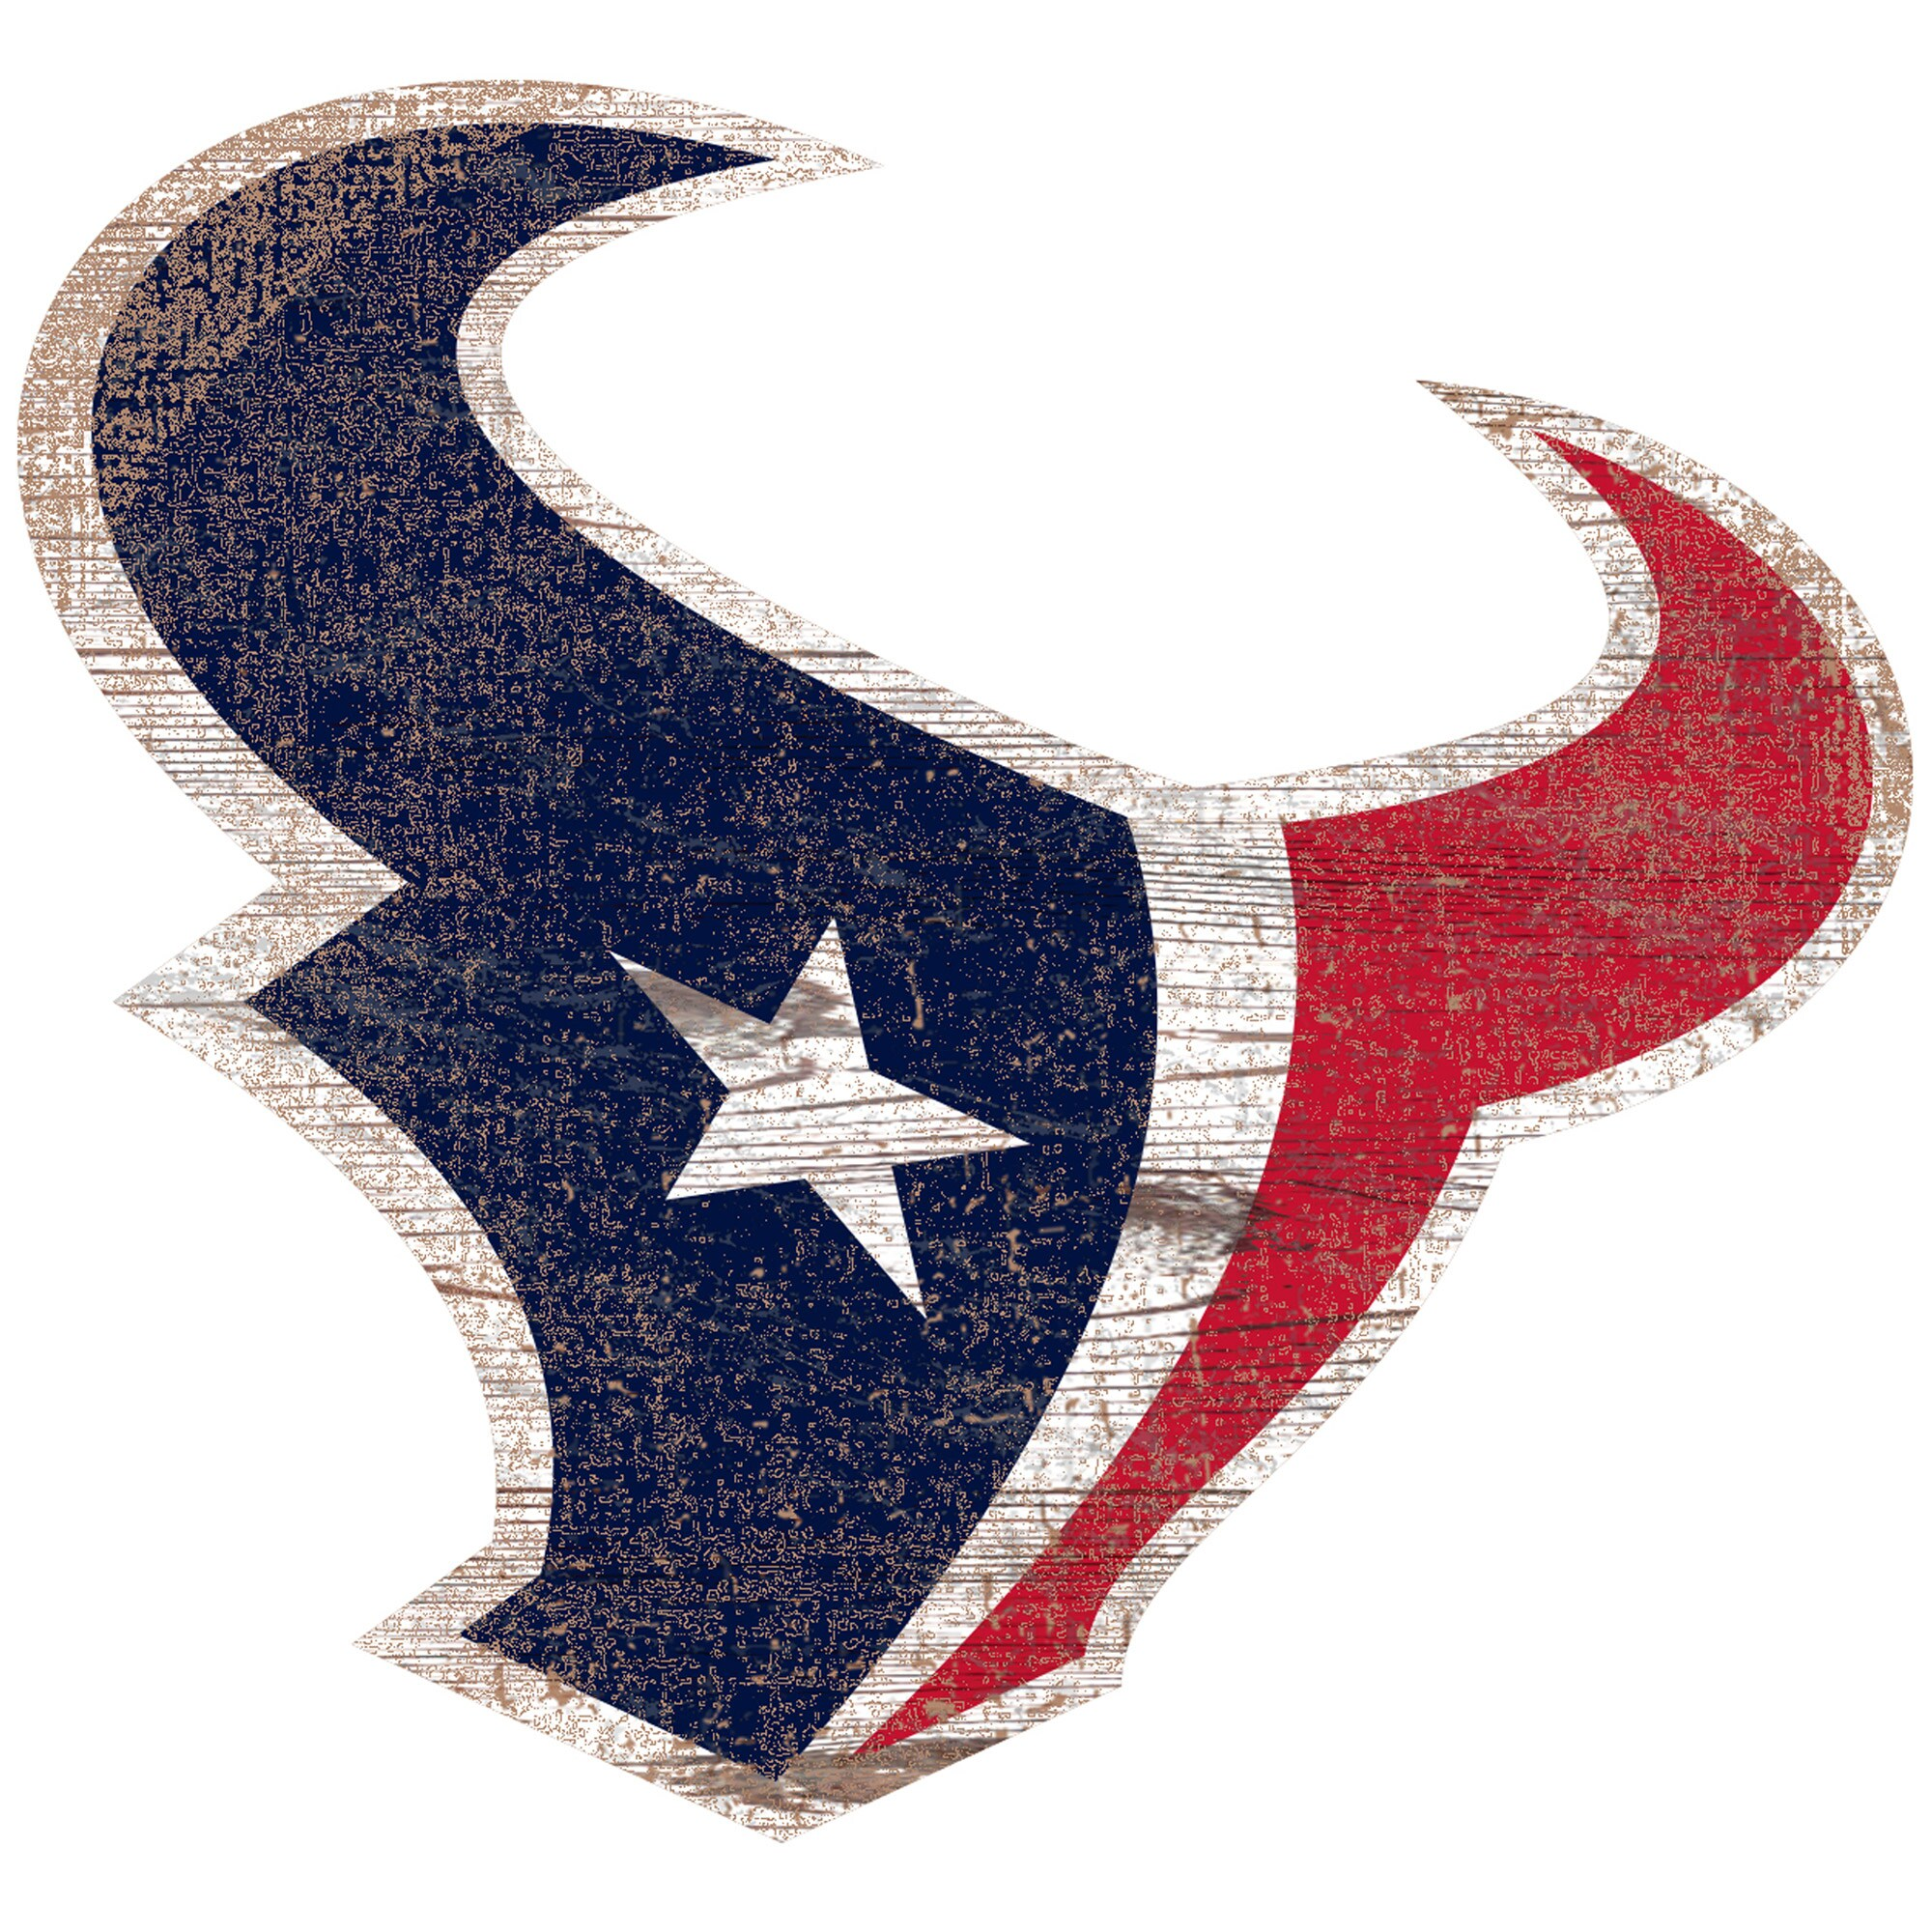 Houston Texans 24'' x 24'' Distressed Logo Cutout Sign